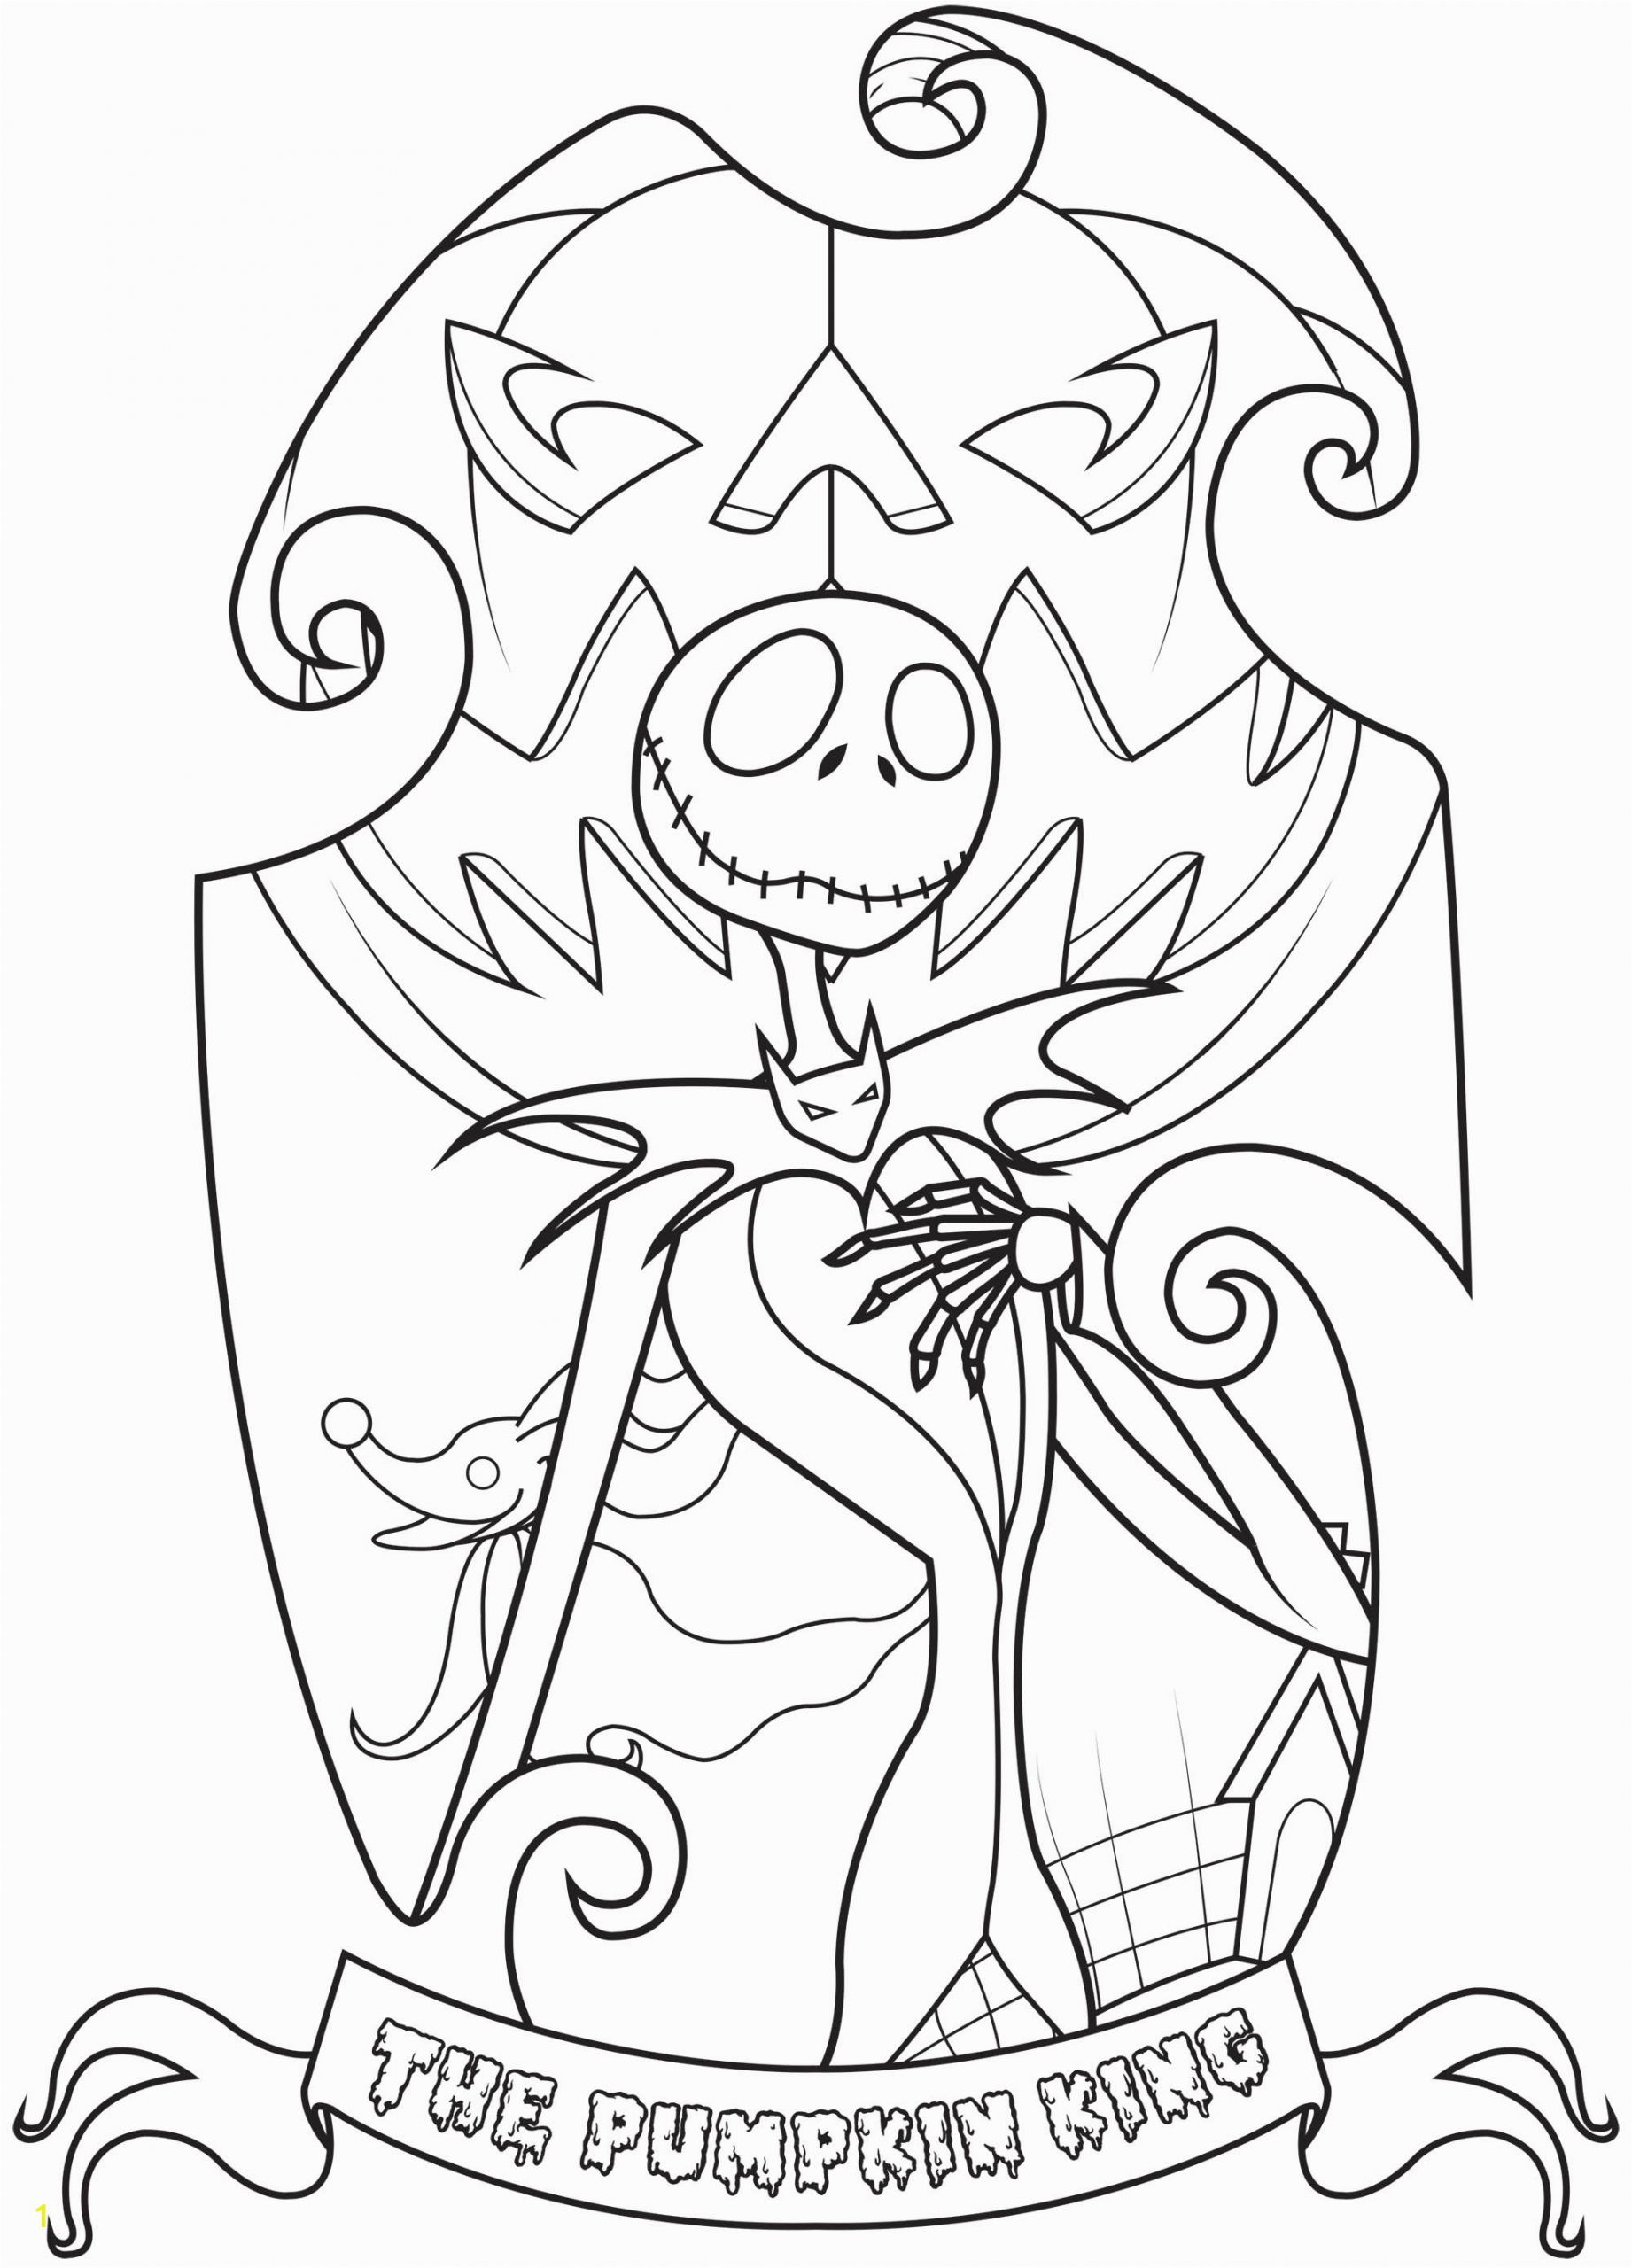 image=the nightmare before christmas coloring jack skellington king of halloween town simple 1